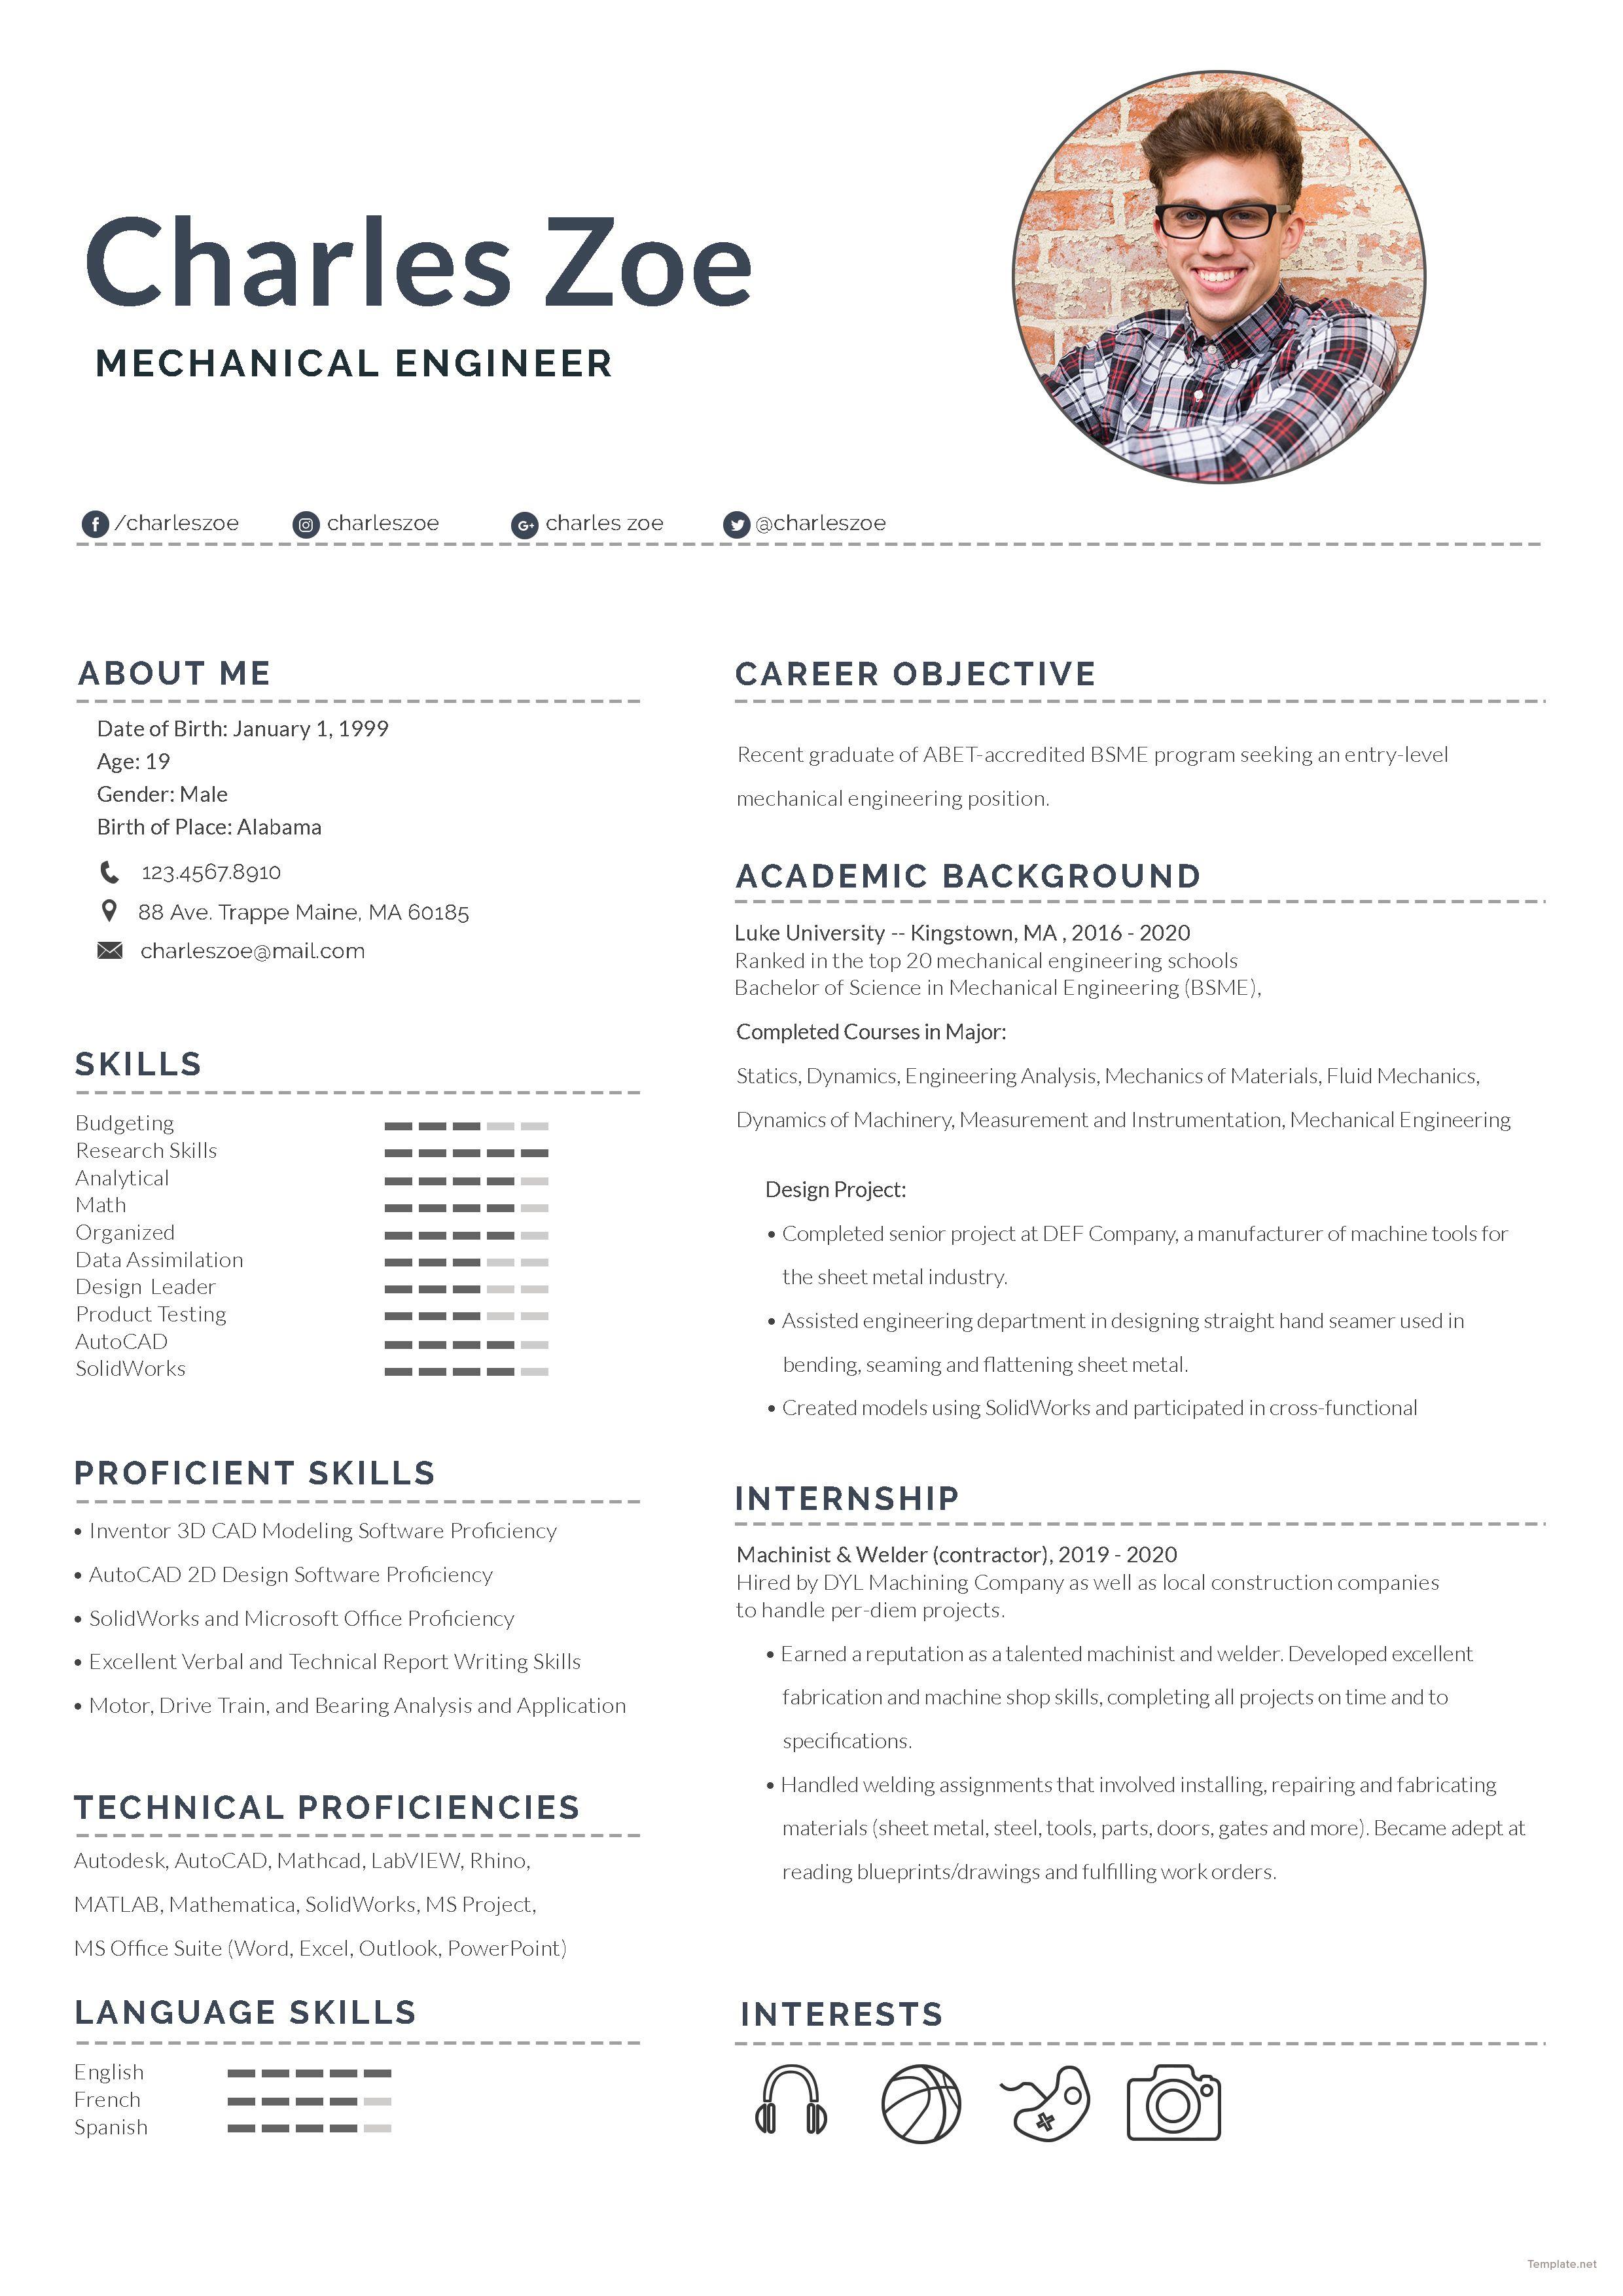 Mechanical Engineer Fresher Resume Template Free Psd Word Apple Pages Template Net Lebenslauf Lebenslaufvorlage Kostenlos Lebenslauf Vorlagen Word